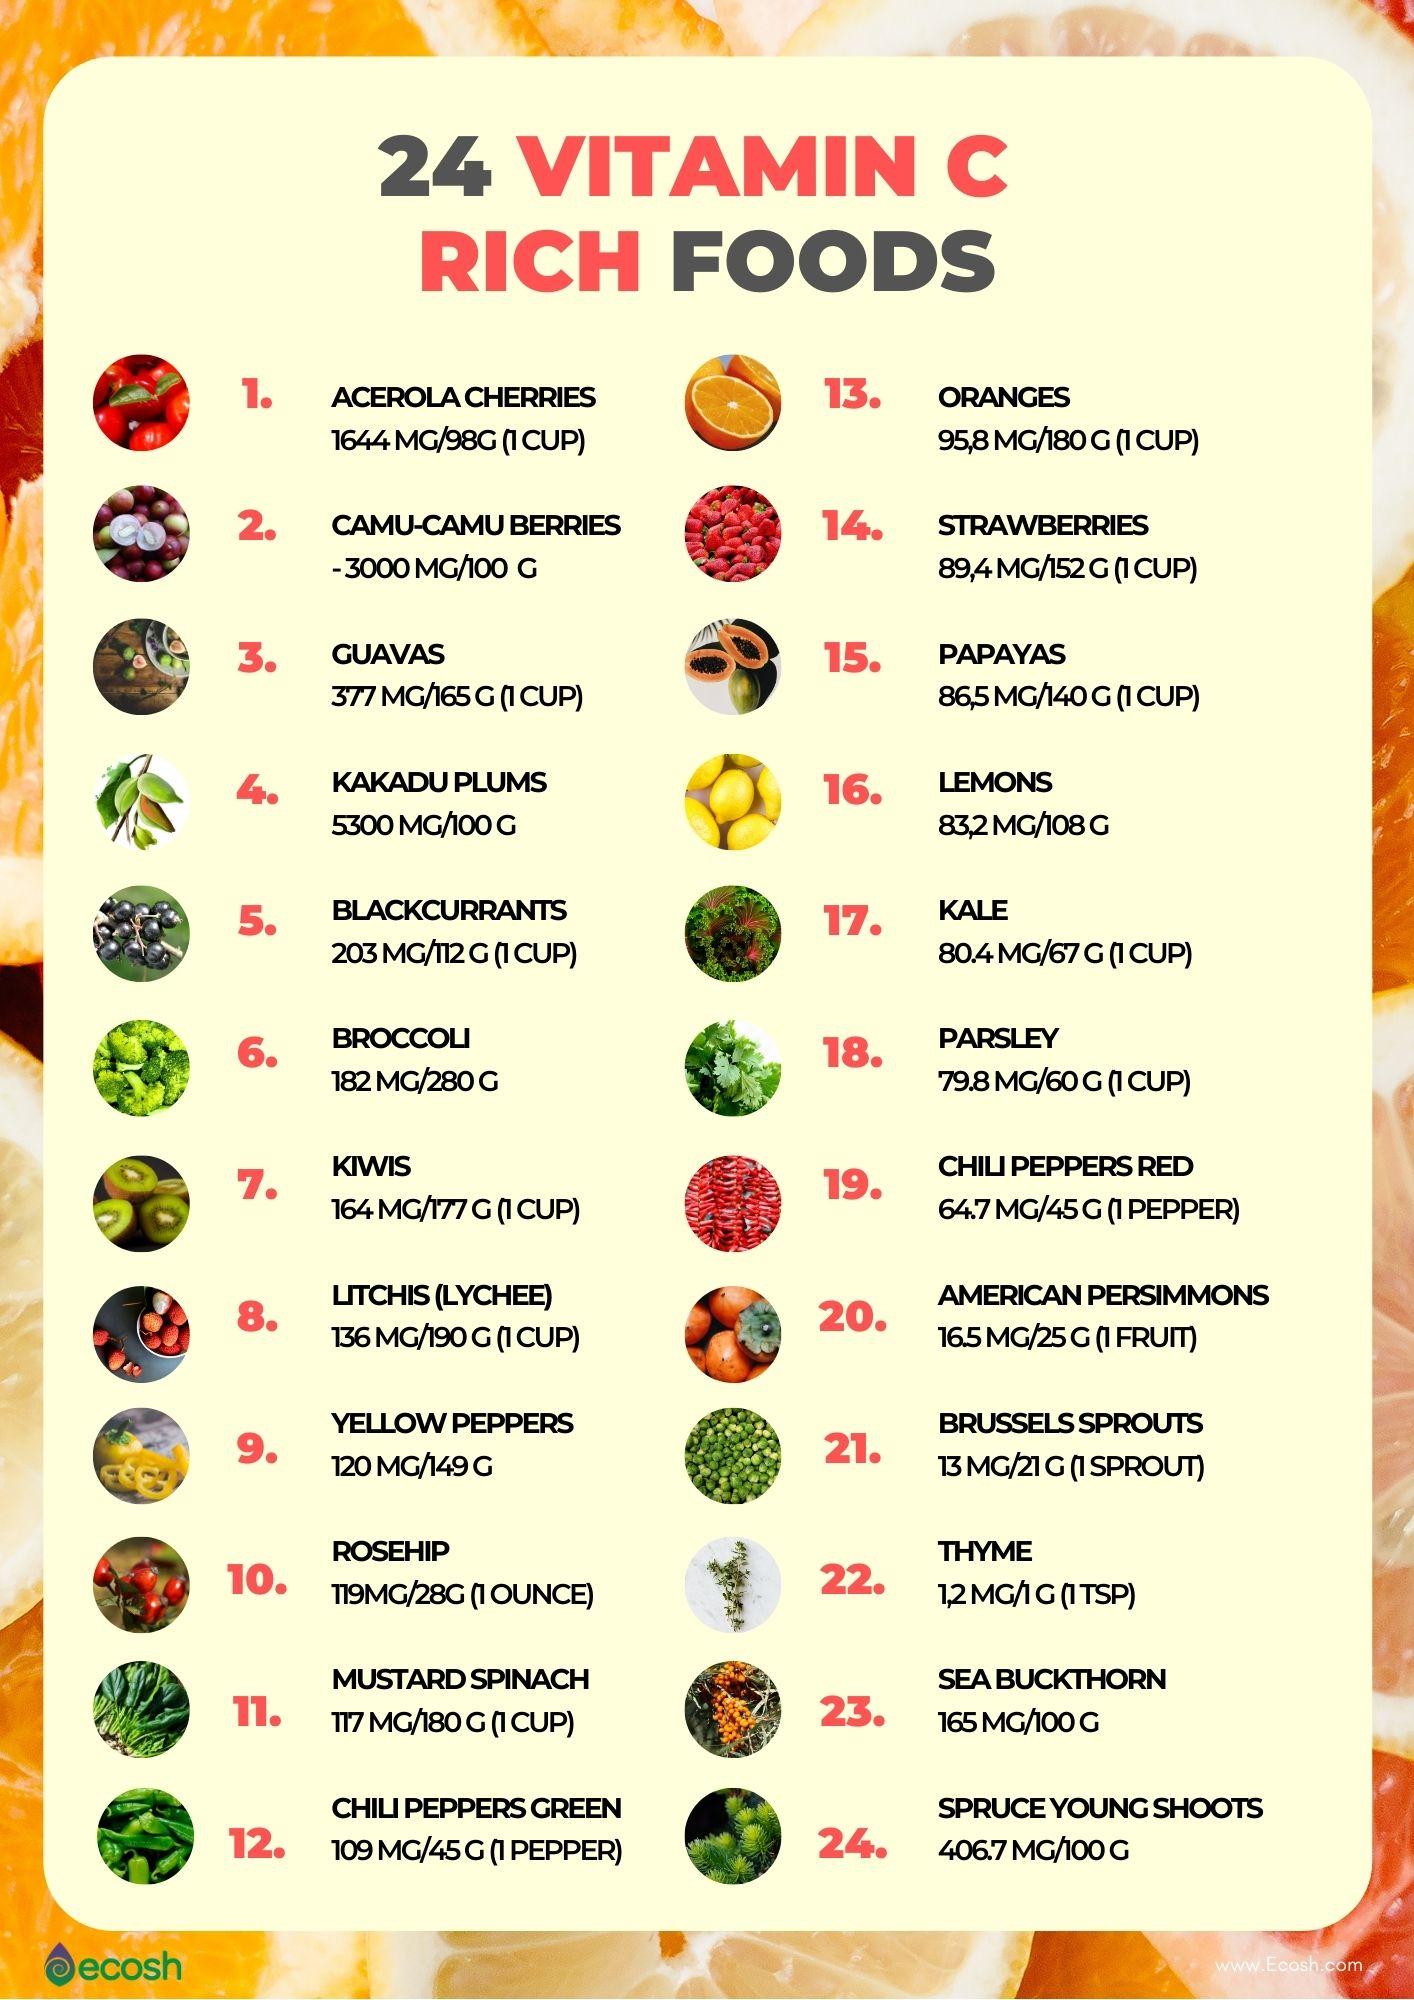 Ecosh_2020_Vitamin_C_Rich_Foods_Vitamin_C_in_Foods_Top_Vitamin_C_Rich_Foods_Foods_High_in_Vitamin_C_Vitamin_C_Rich_Fruits_Vitamin_C_Rich_Vegetables